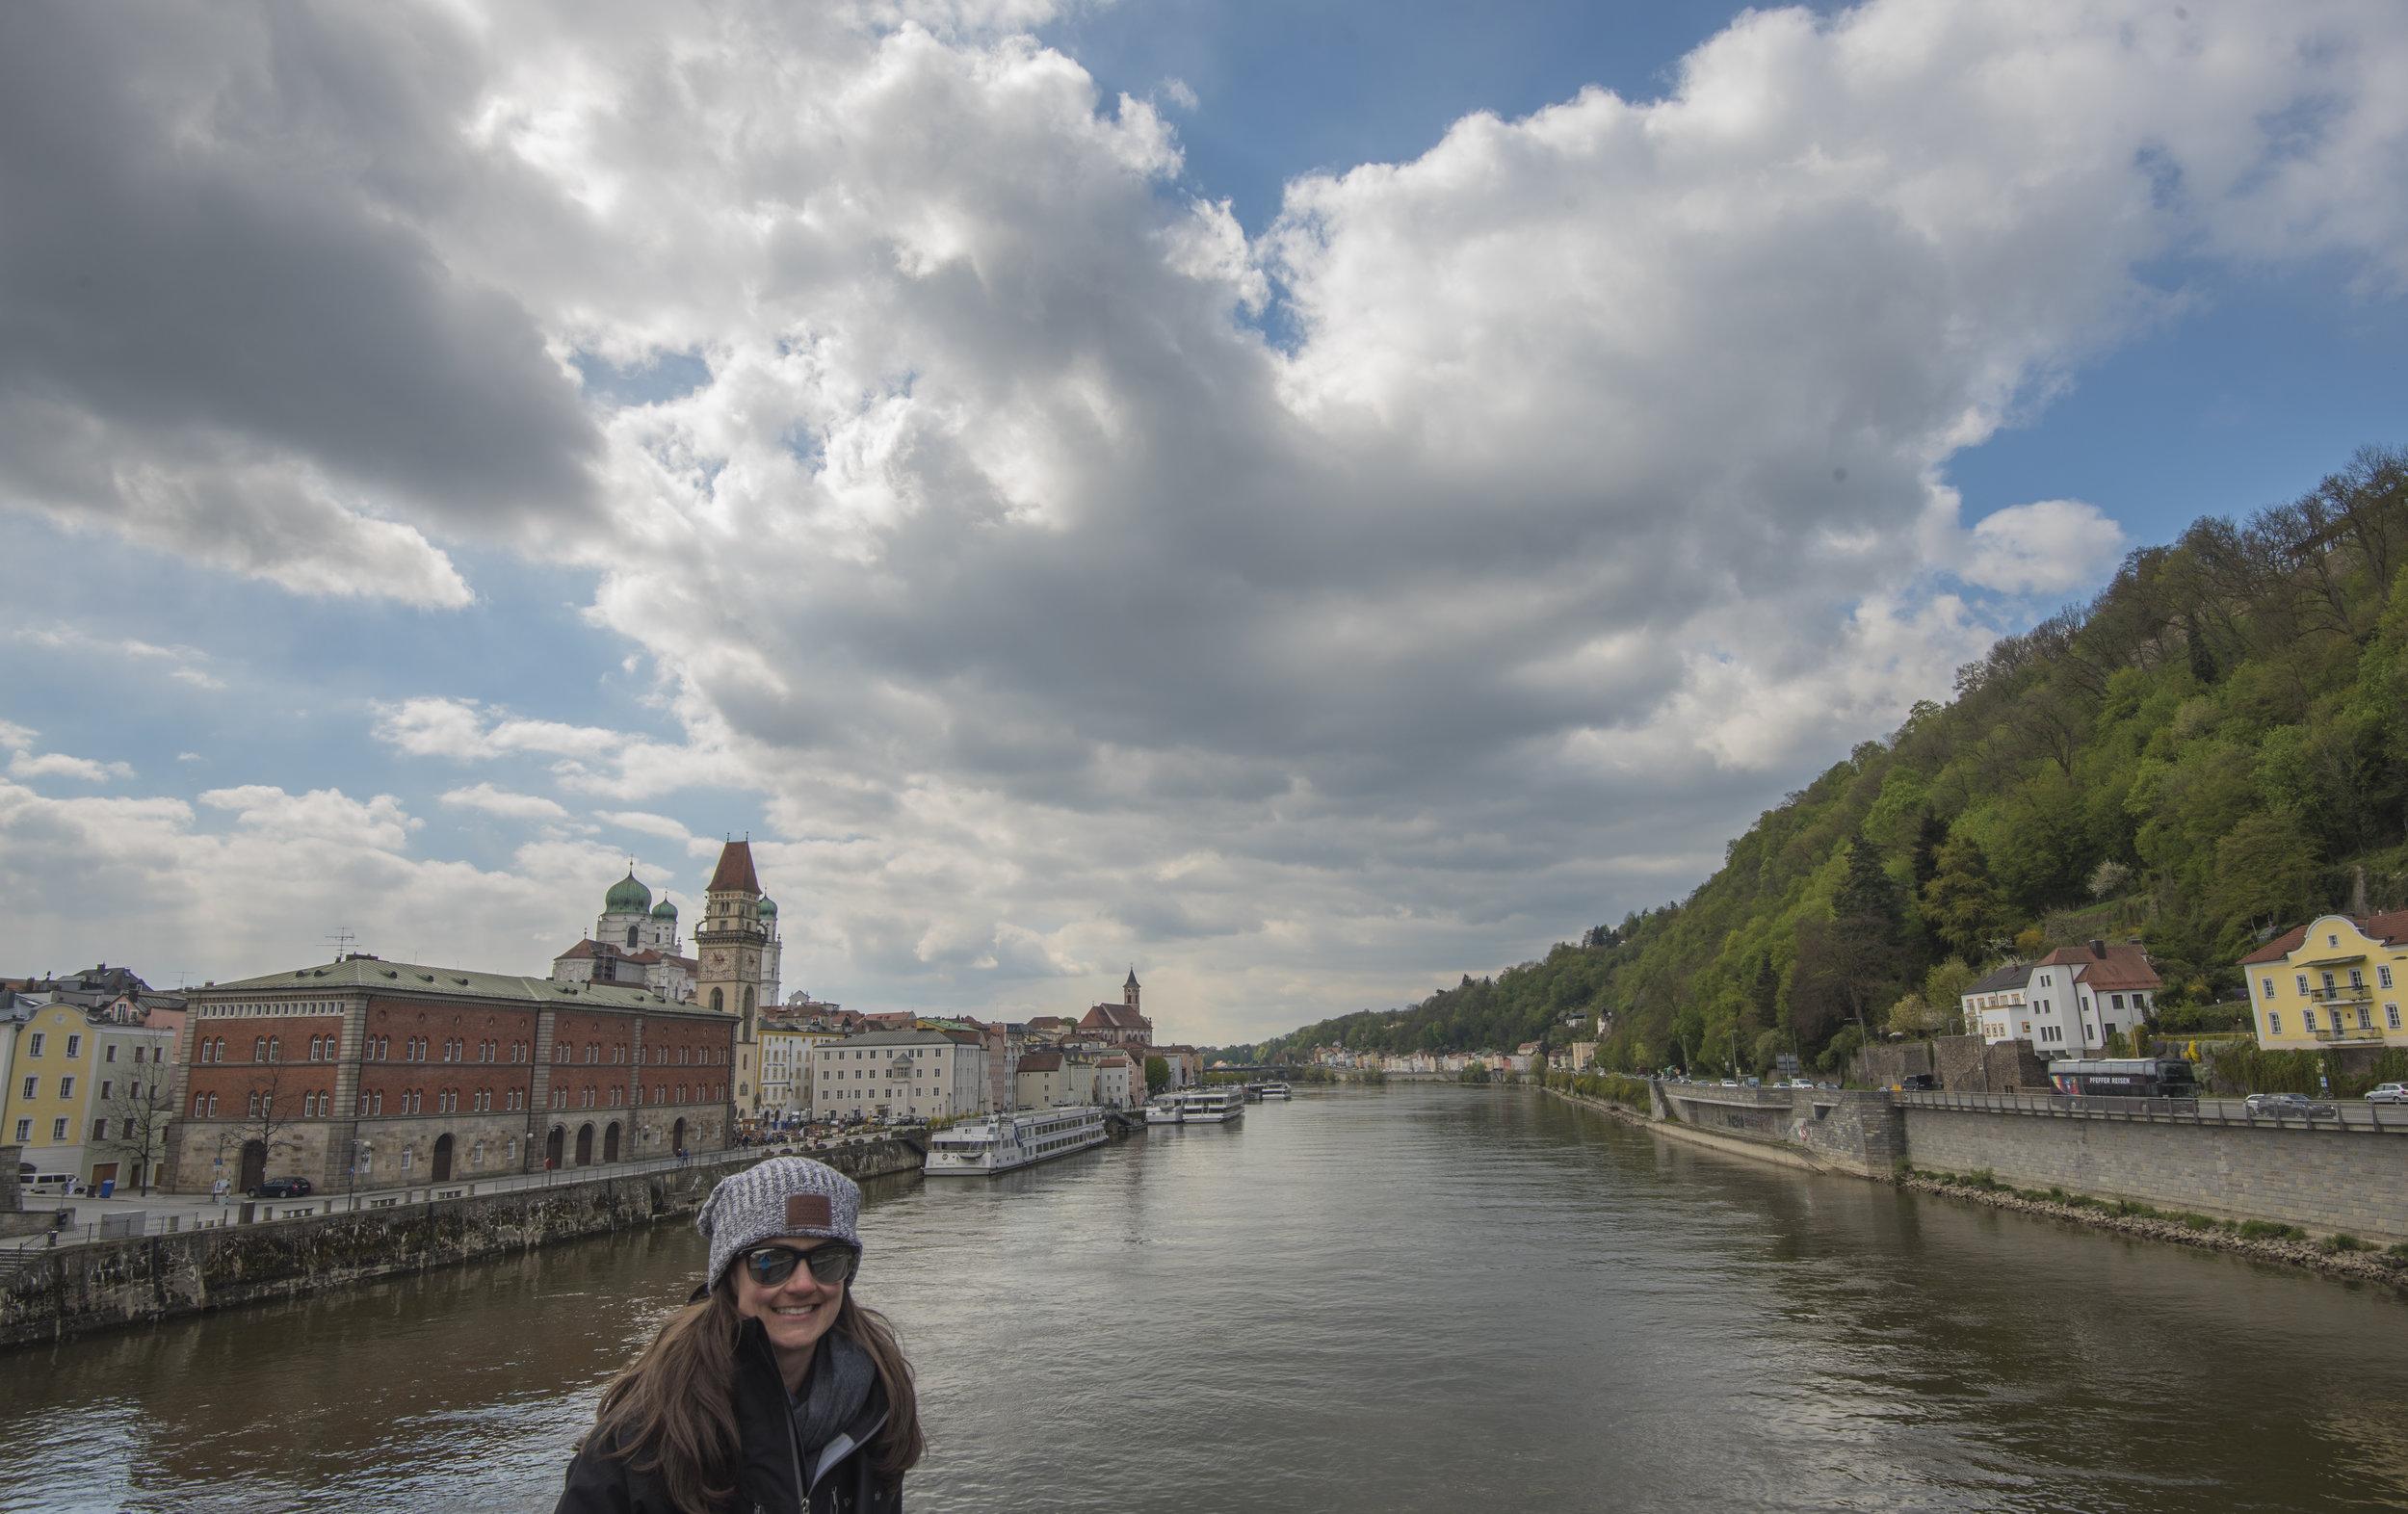 Kirby in Passau